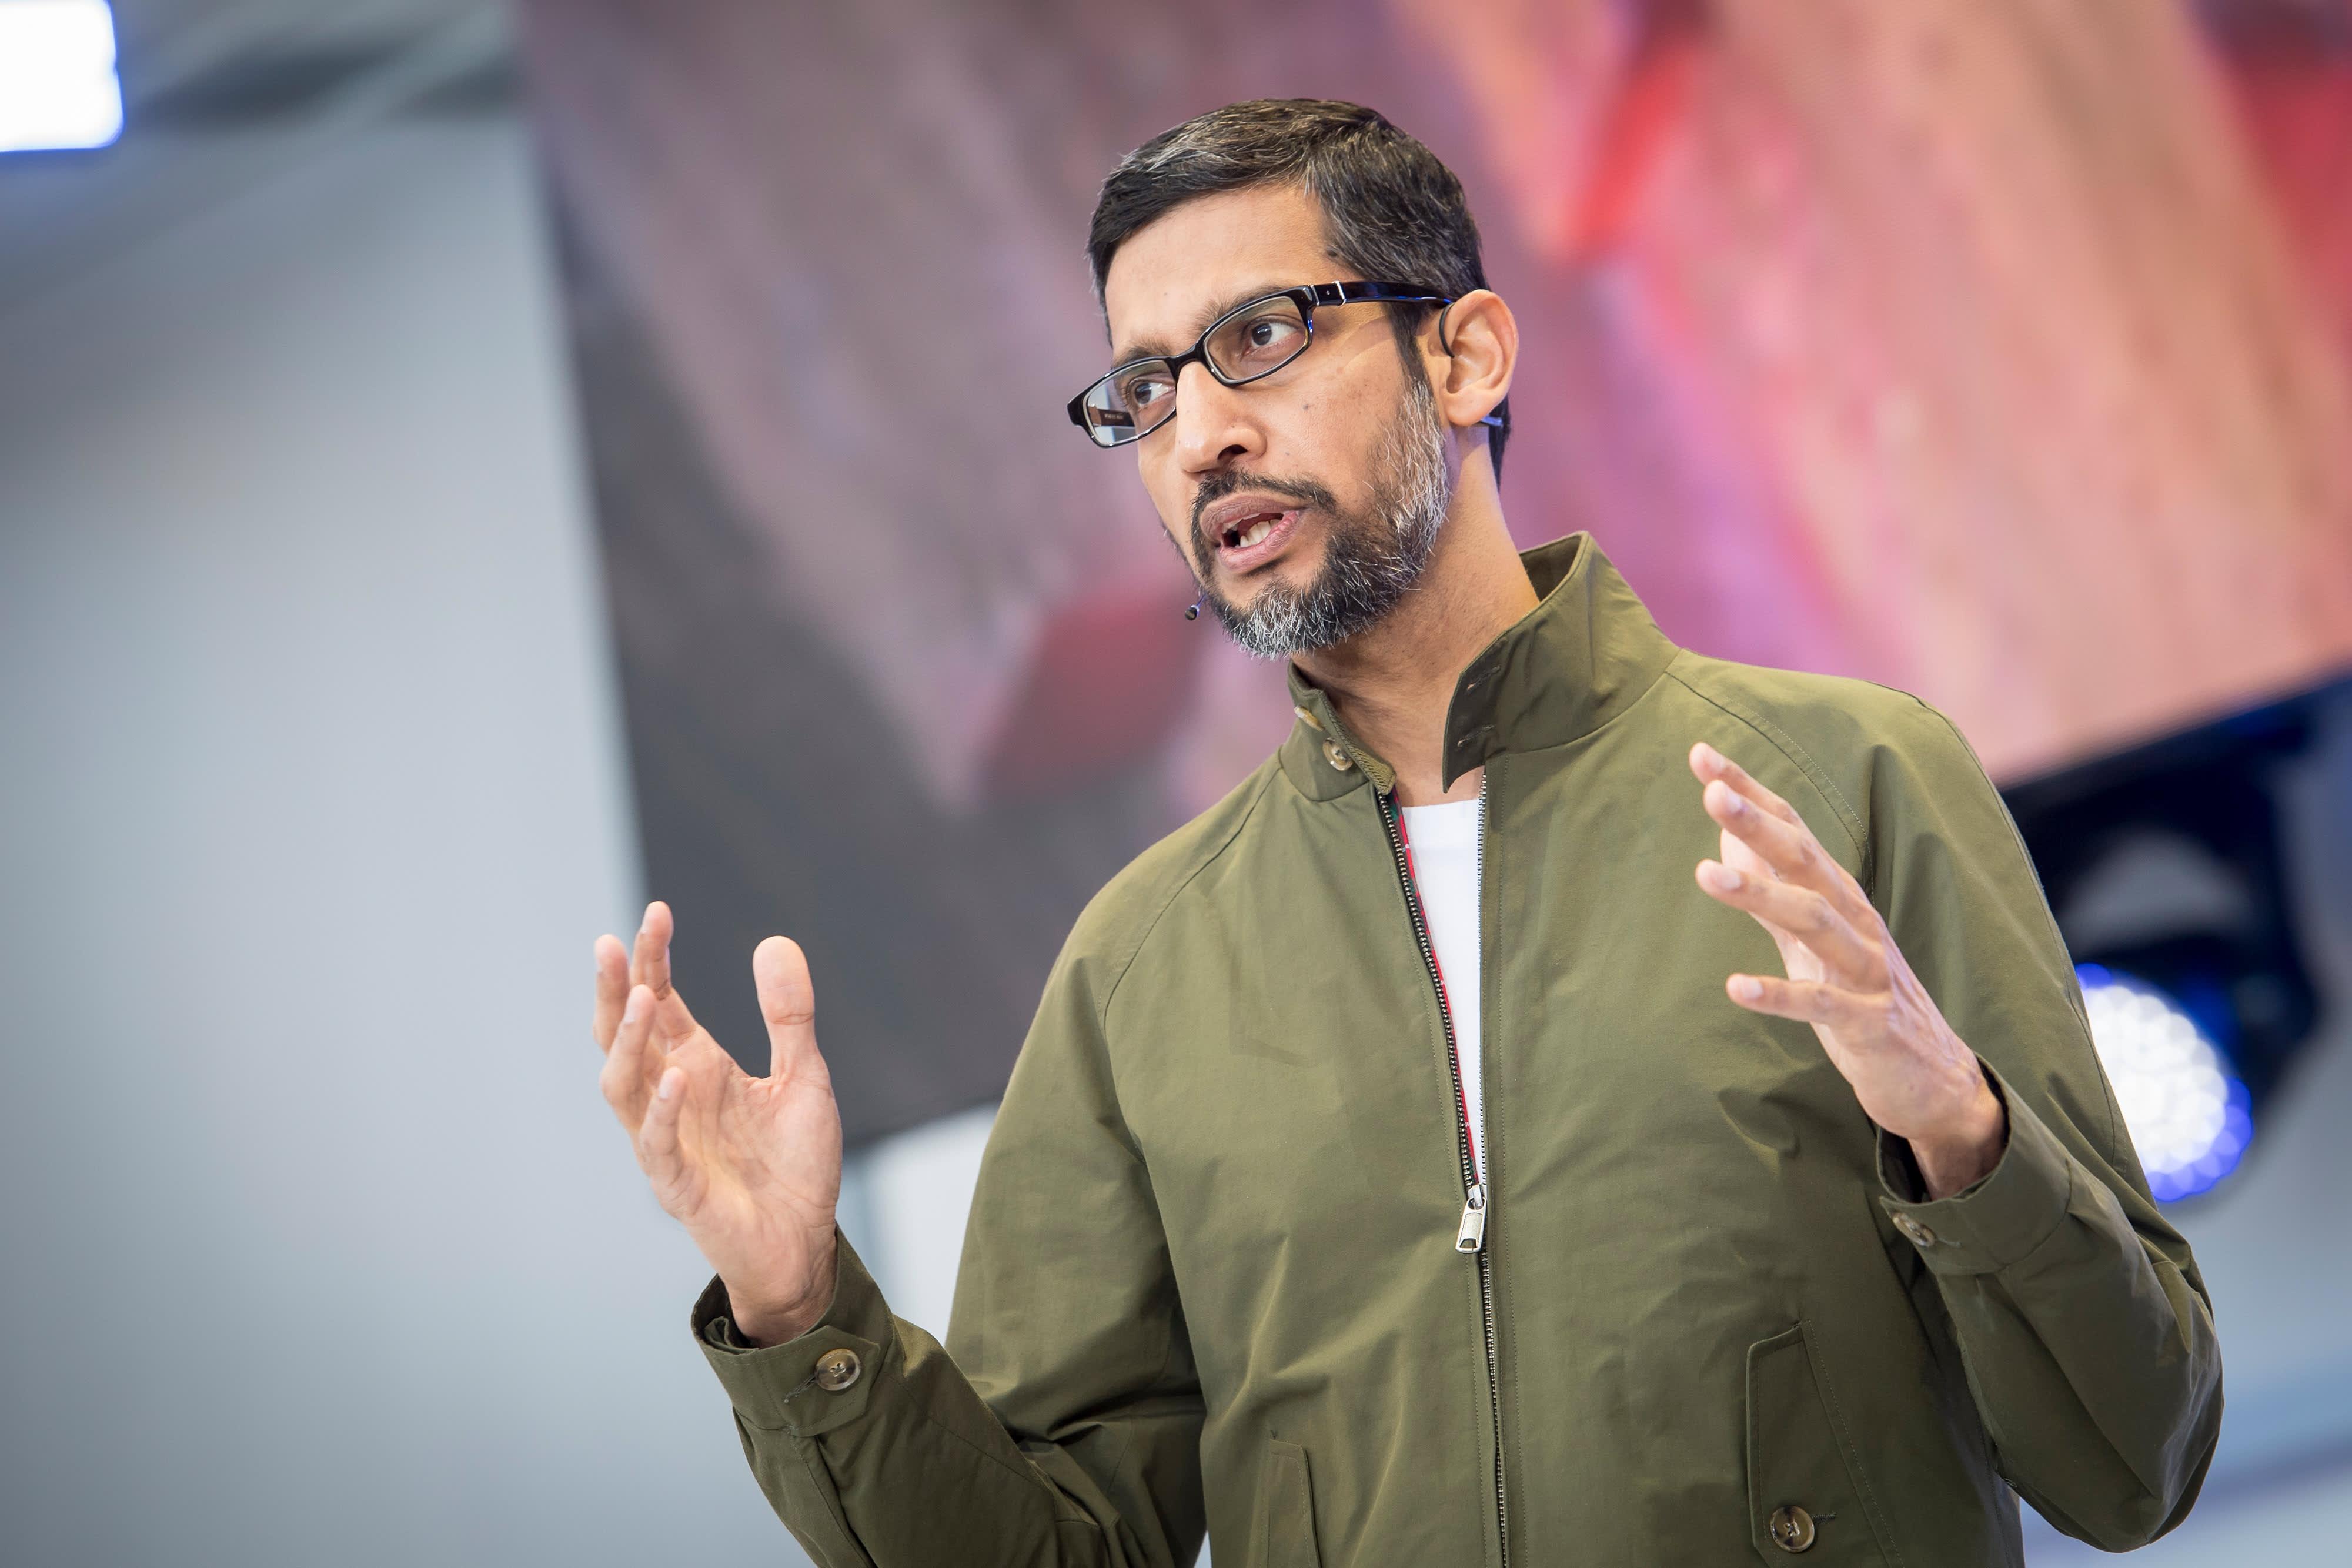 Google CEO Pichais memo regarding changes to sexual harassment policy Google CEO Pichais memo regarding changes to sexual harassment policy new images